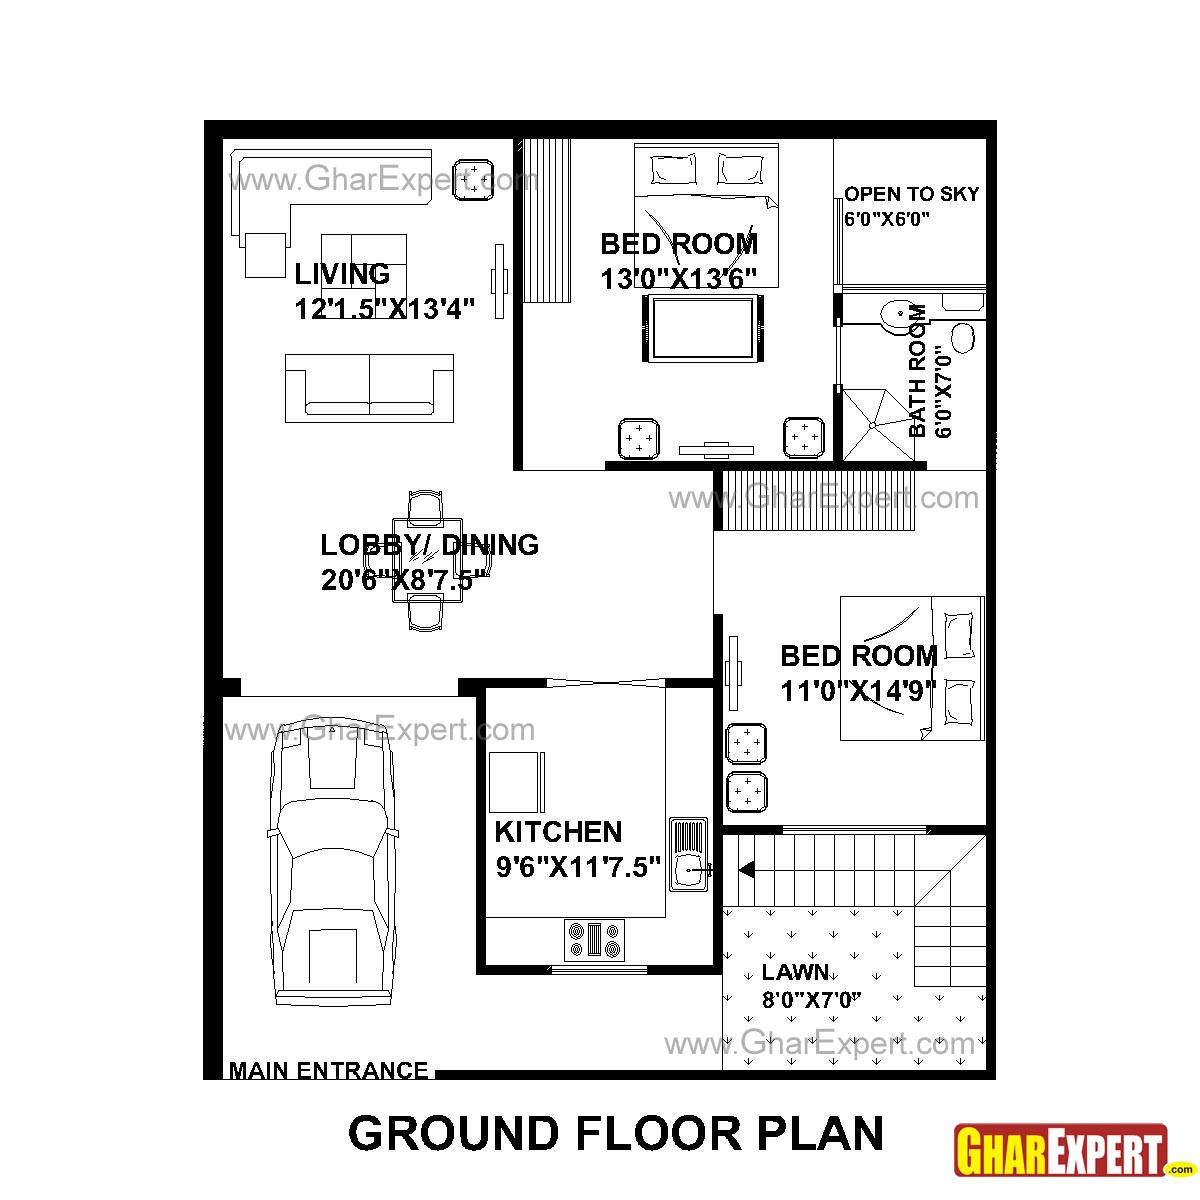 House Plan for 33 Feet by 40 Feet plot (Plot Size 147